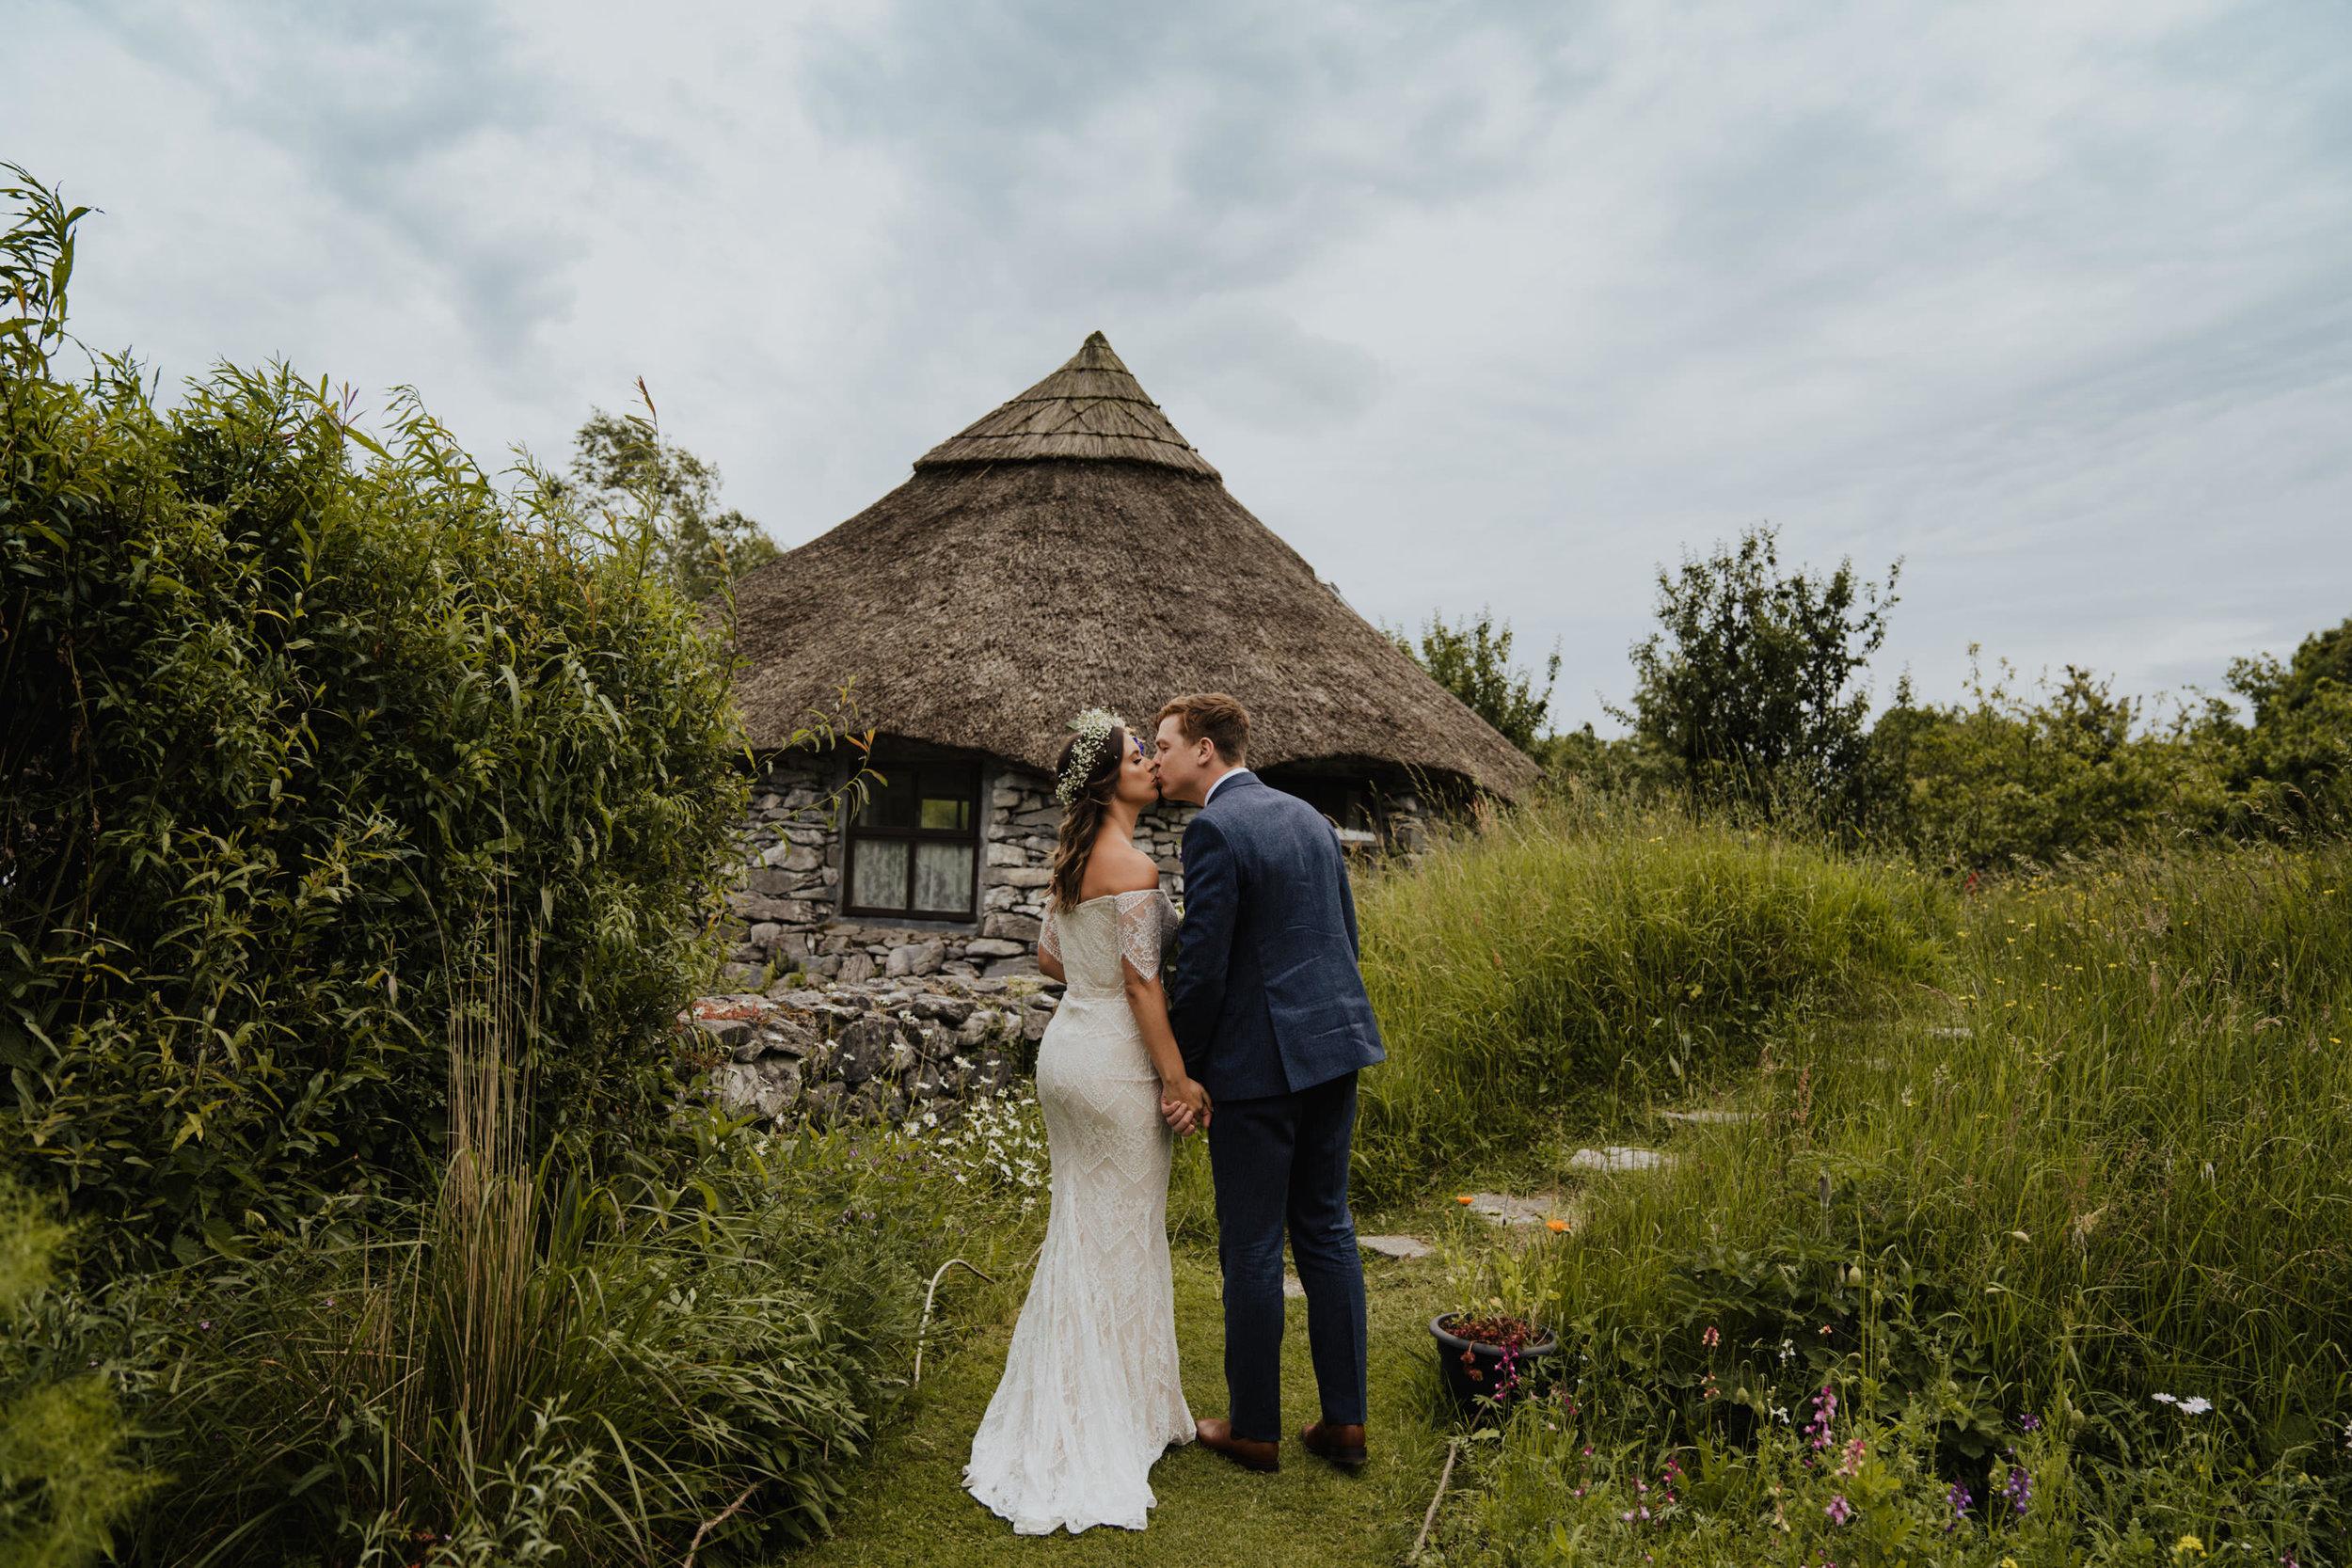 c&j_brigits_garden_galway_wedding_photographer_livia_figueiredo_26.jpg